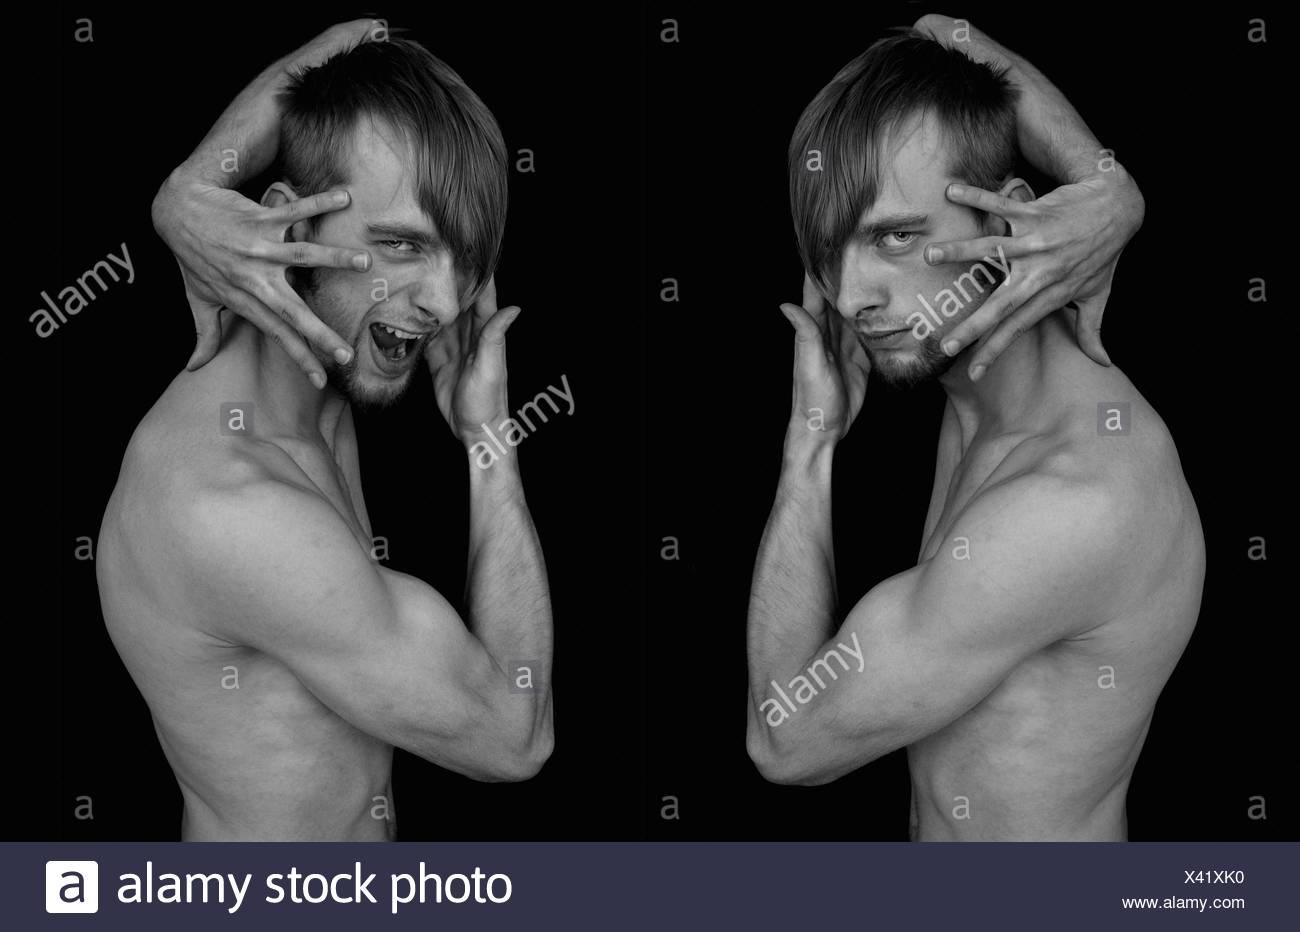 portrait bw gesturing mimic art collage man pose portrait bw gesturing mimic - Stock Image